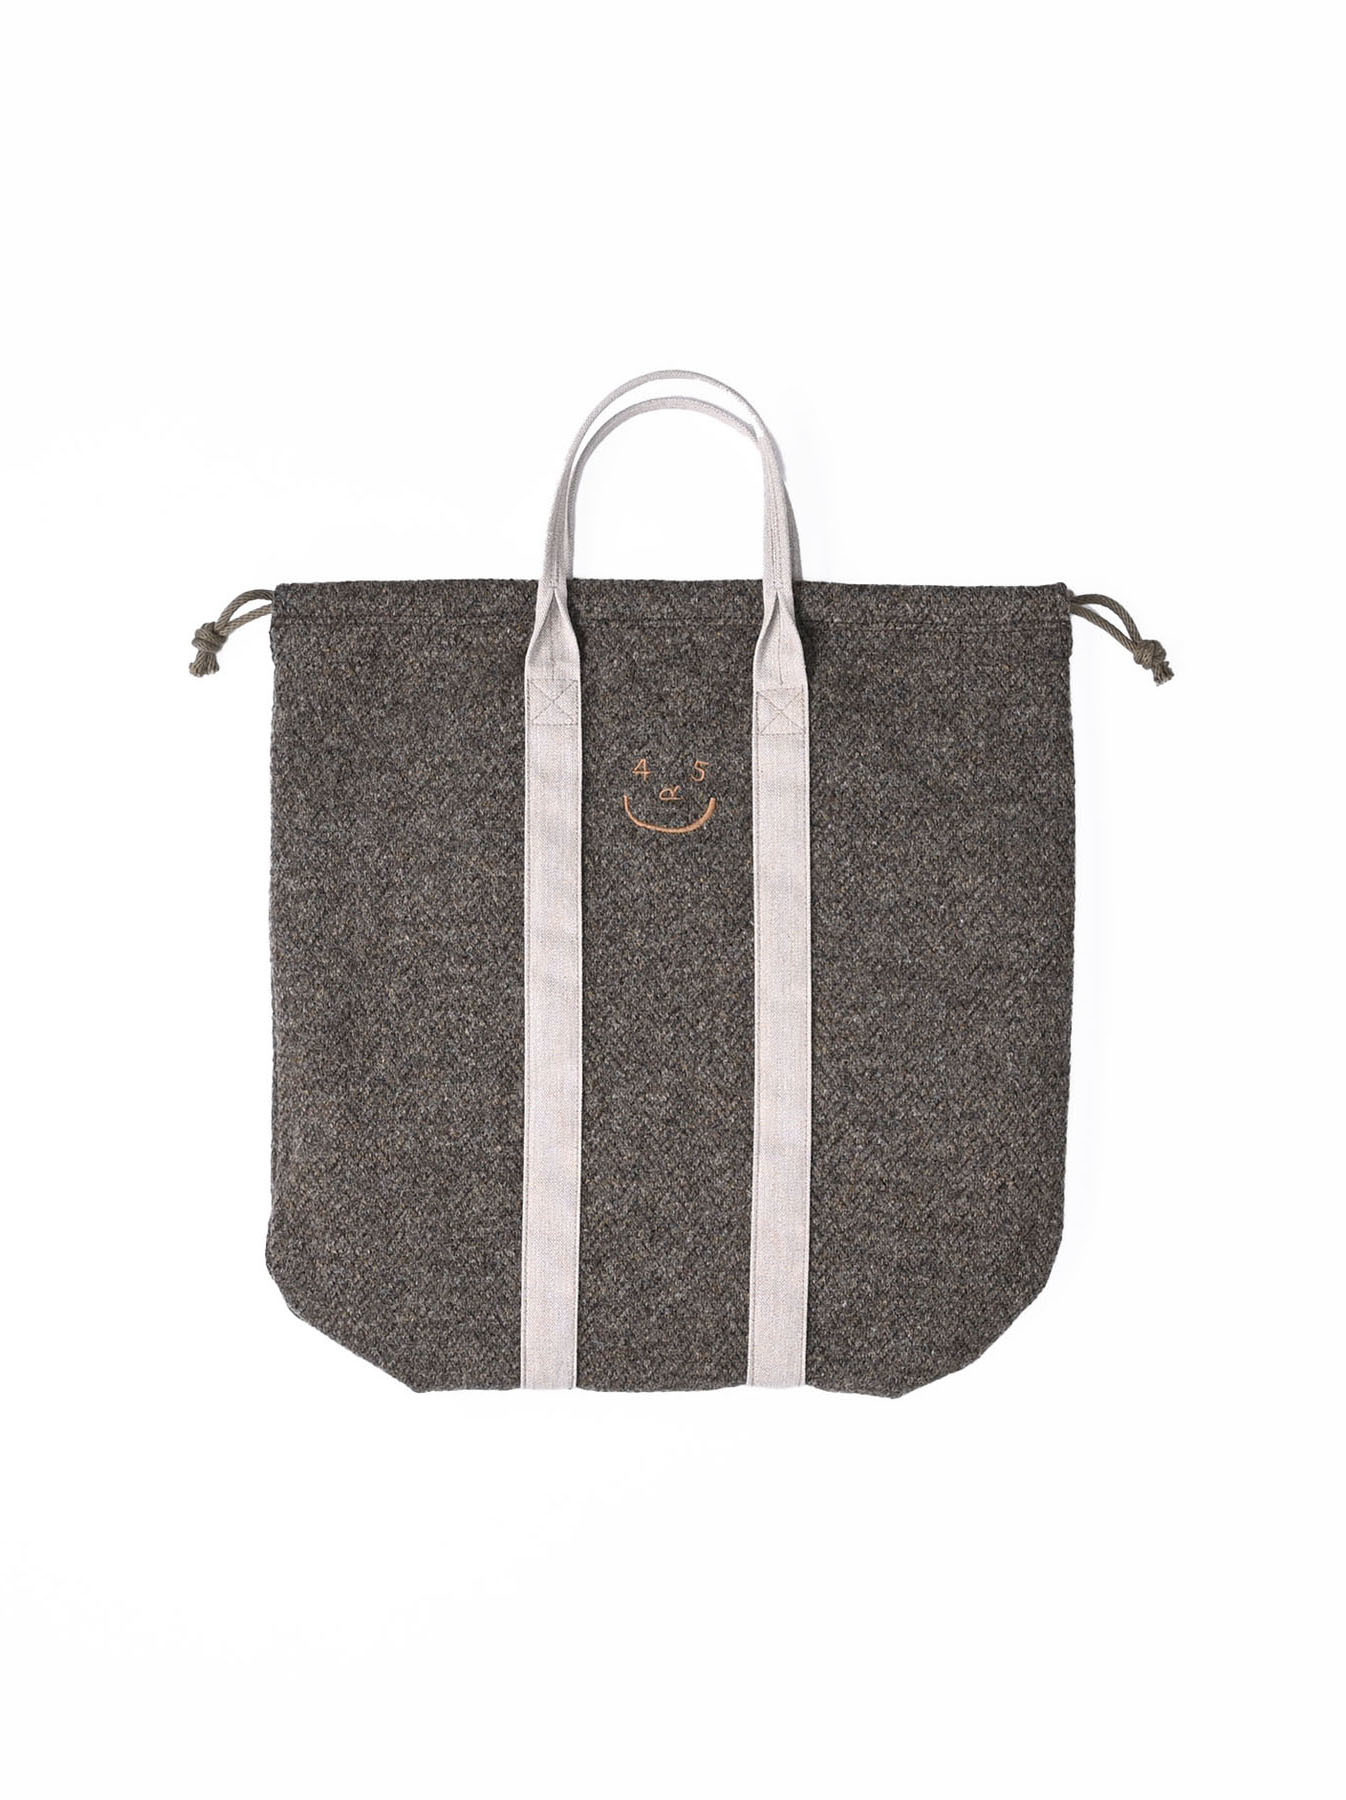 Tweed Knit and Nylon Tote Bag-4